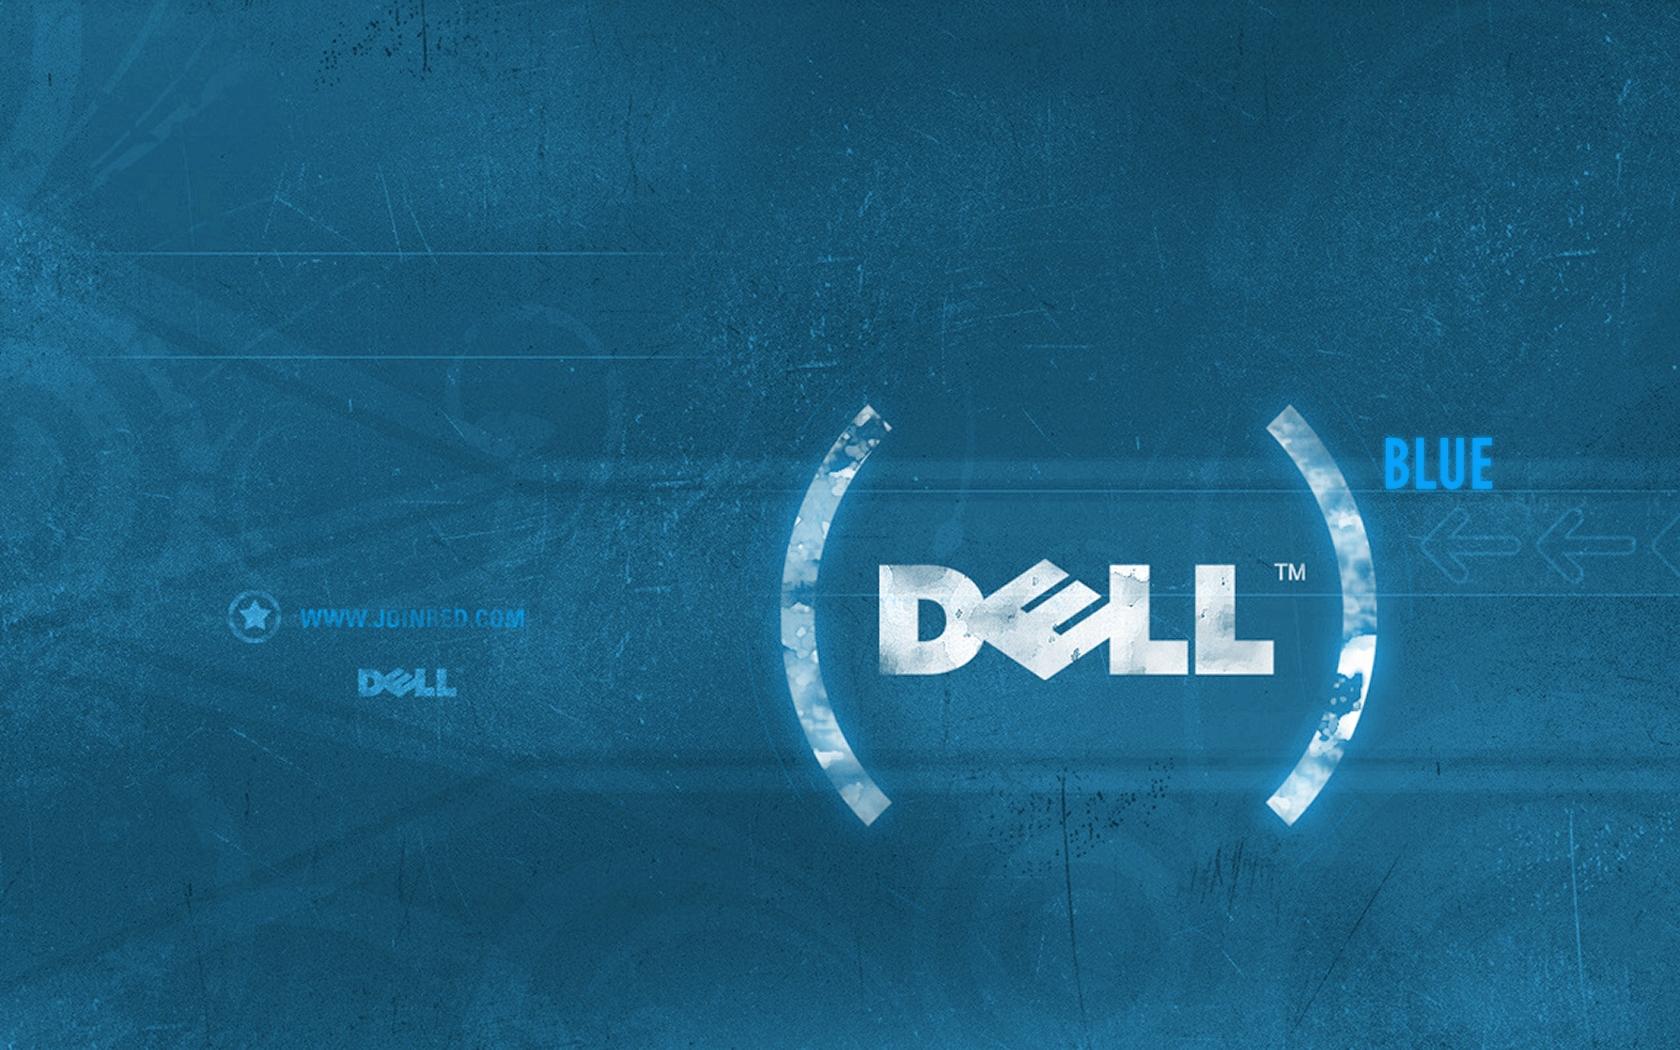 Best 40 Dell Phone Wallpaper on HipWallpaper Dell Wallpaper 1680x1050